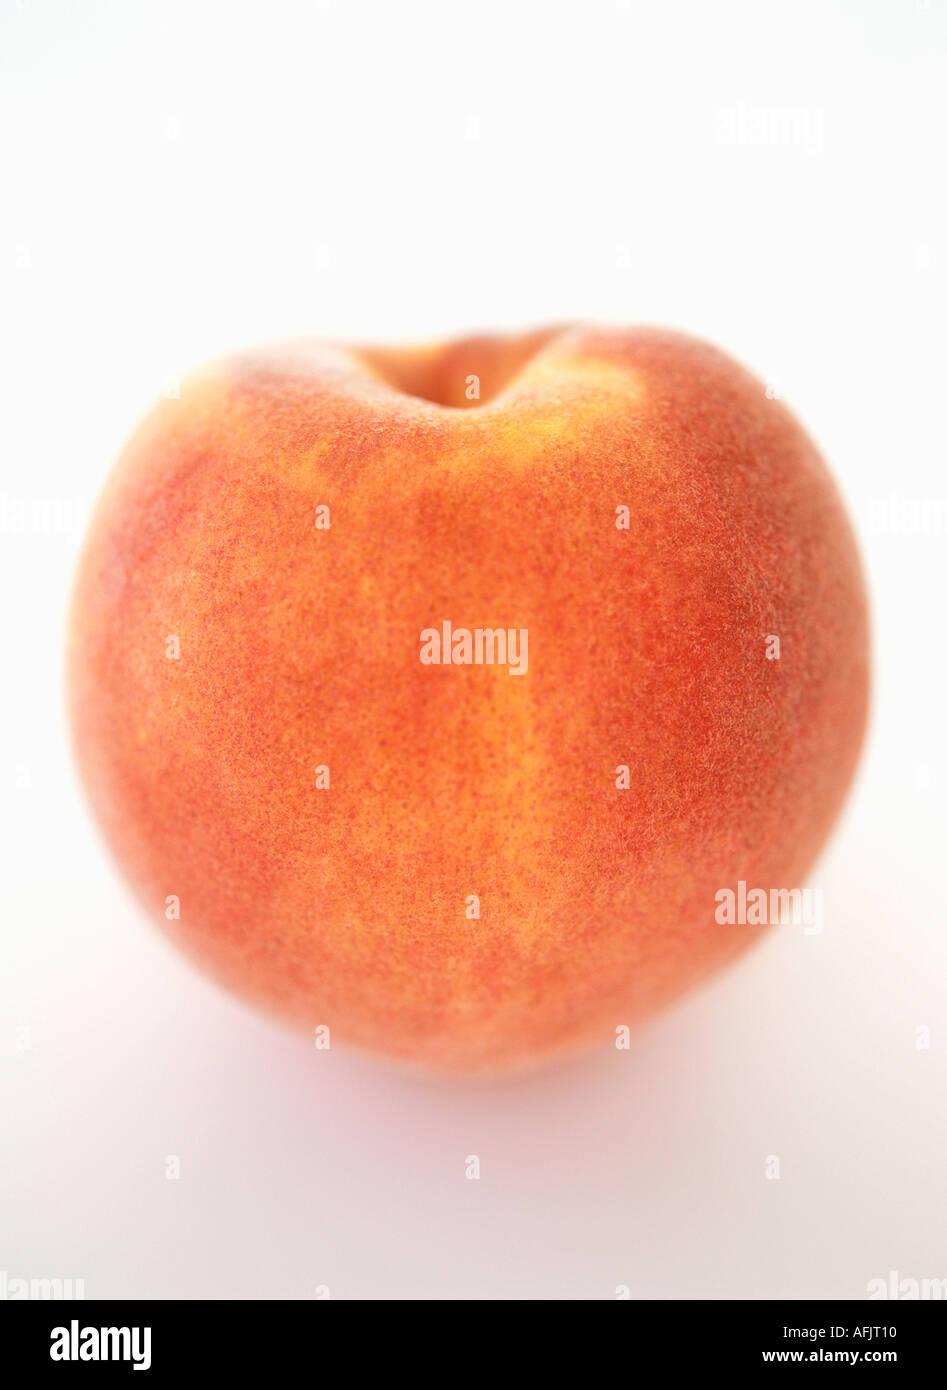 Peach on white background - Stock Image